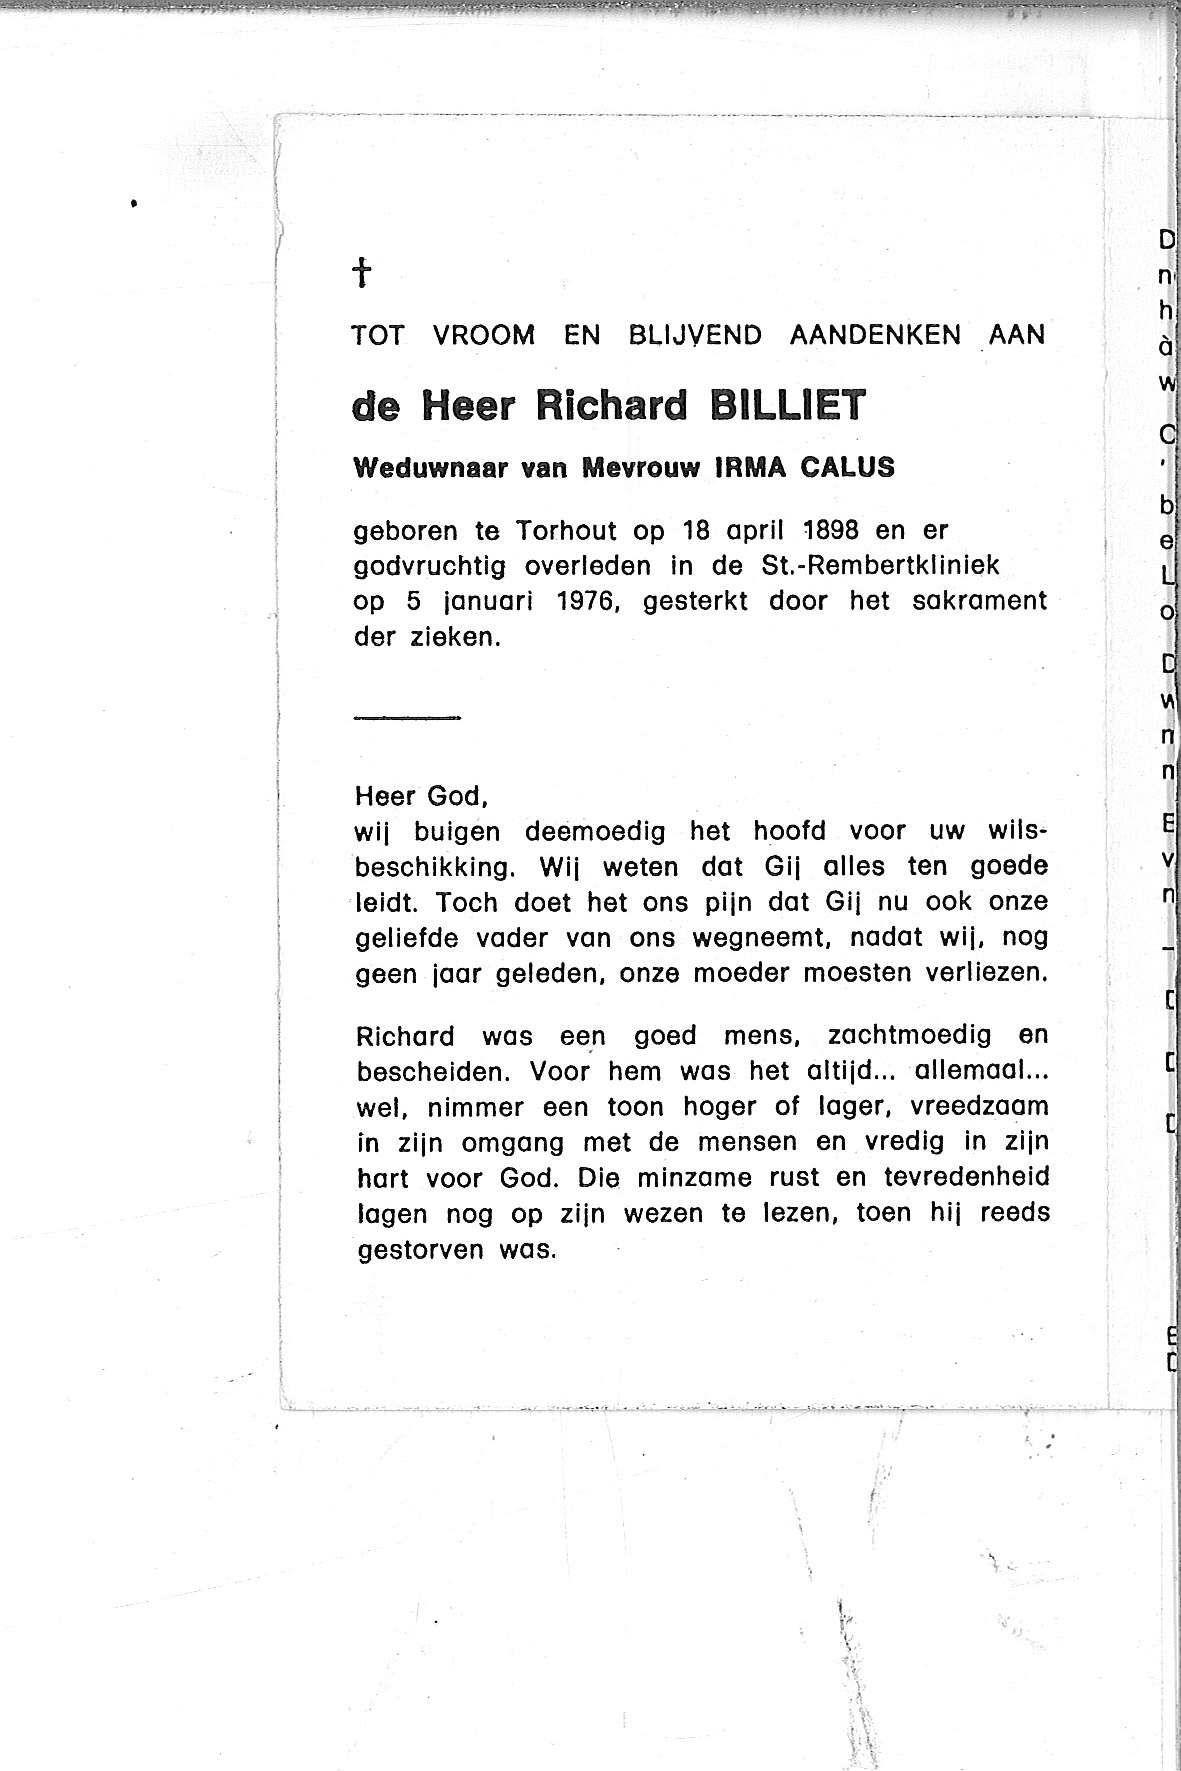 Richard(1976)20130904132056_00161.jpg